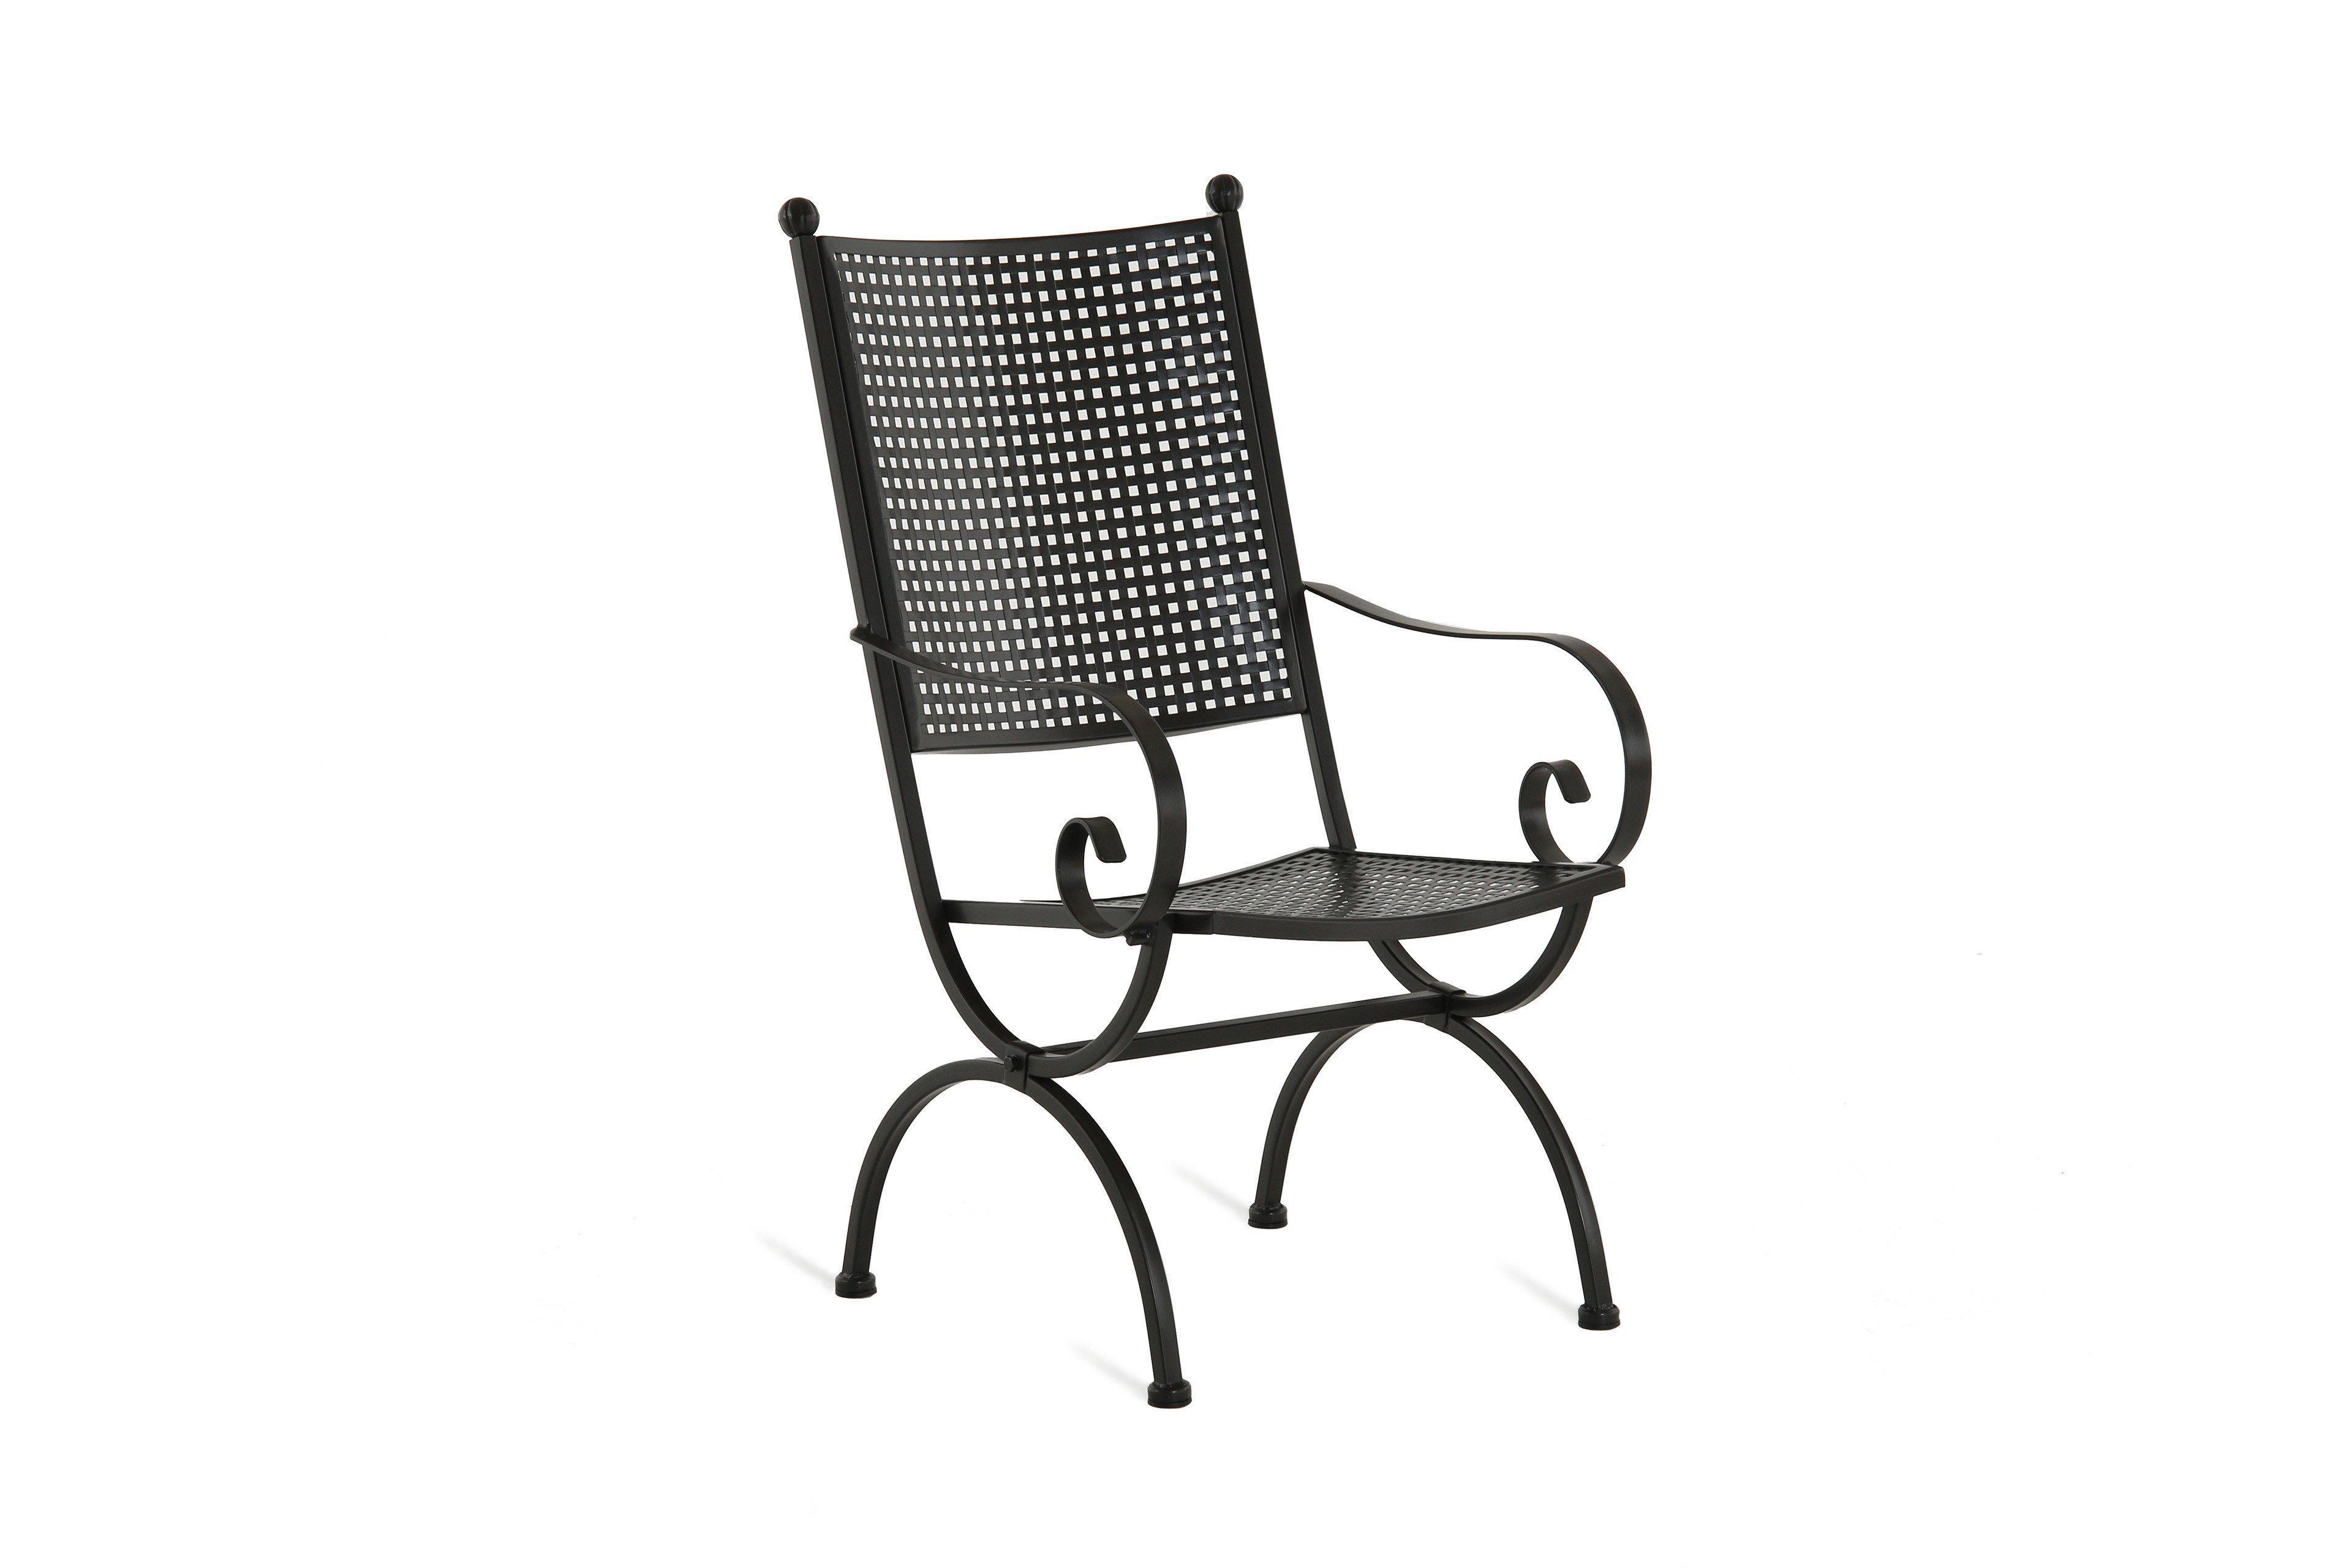 MBM Sessel Elegance Romeo 156.123 | Möbel Letz - Ihr Online-Shop